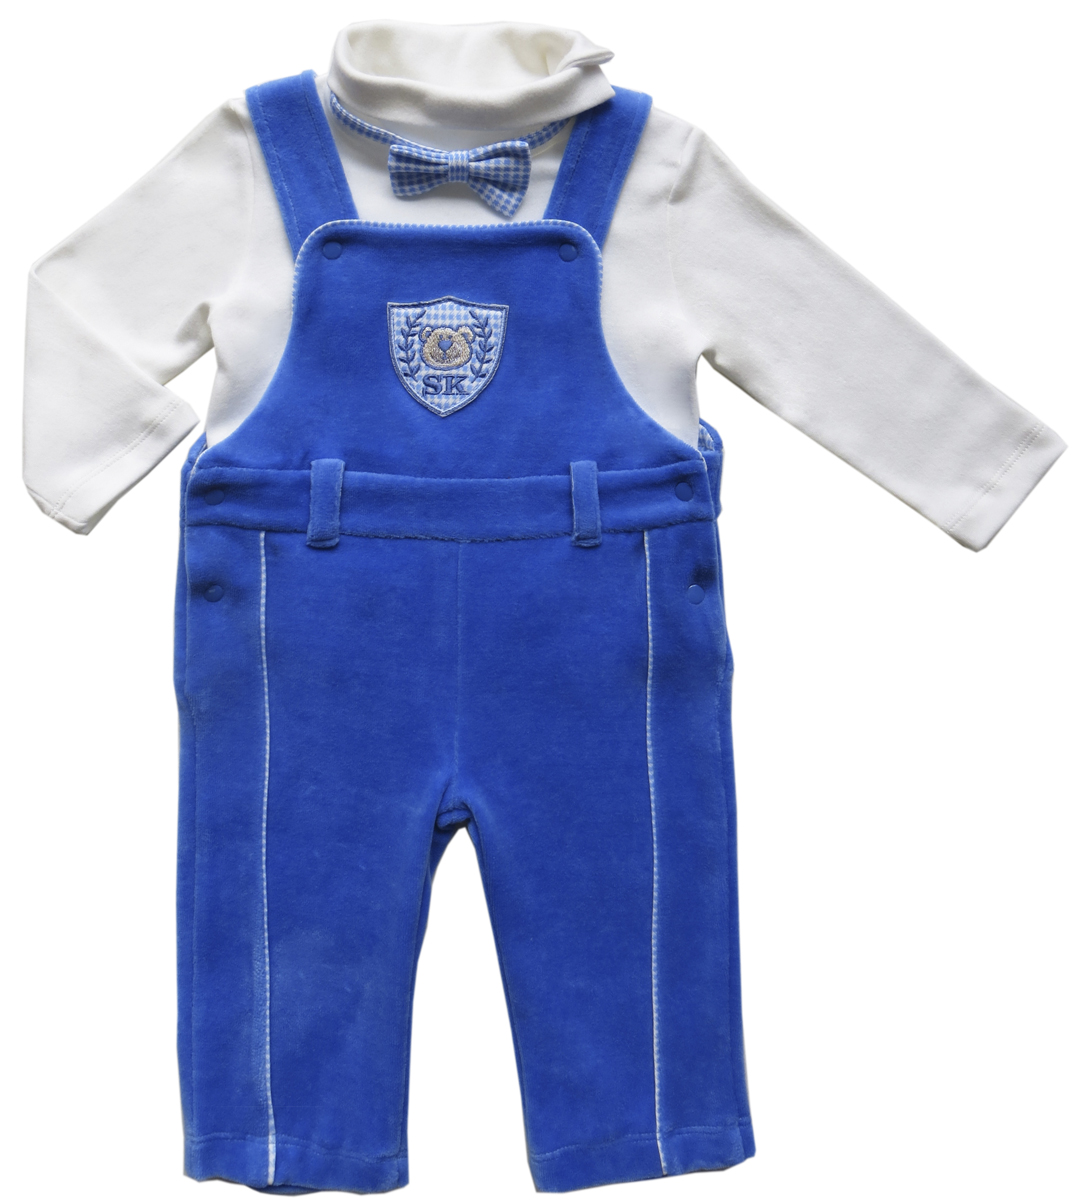 Комплект для мальчика Soni Kids Мишка джентельмен: водолазка, полукомбинезон, цвет: белый, синий. З6121023. Размер 86 soni kids кофточка